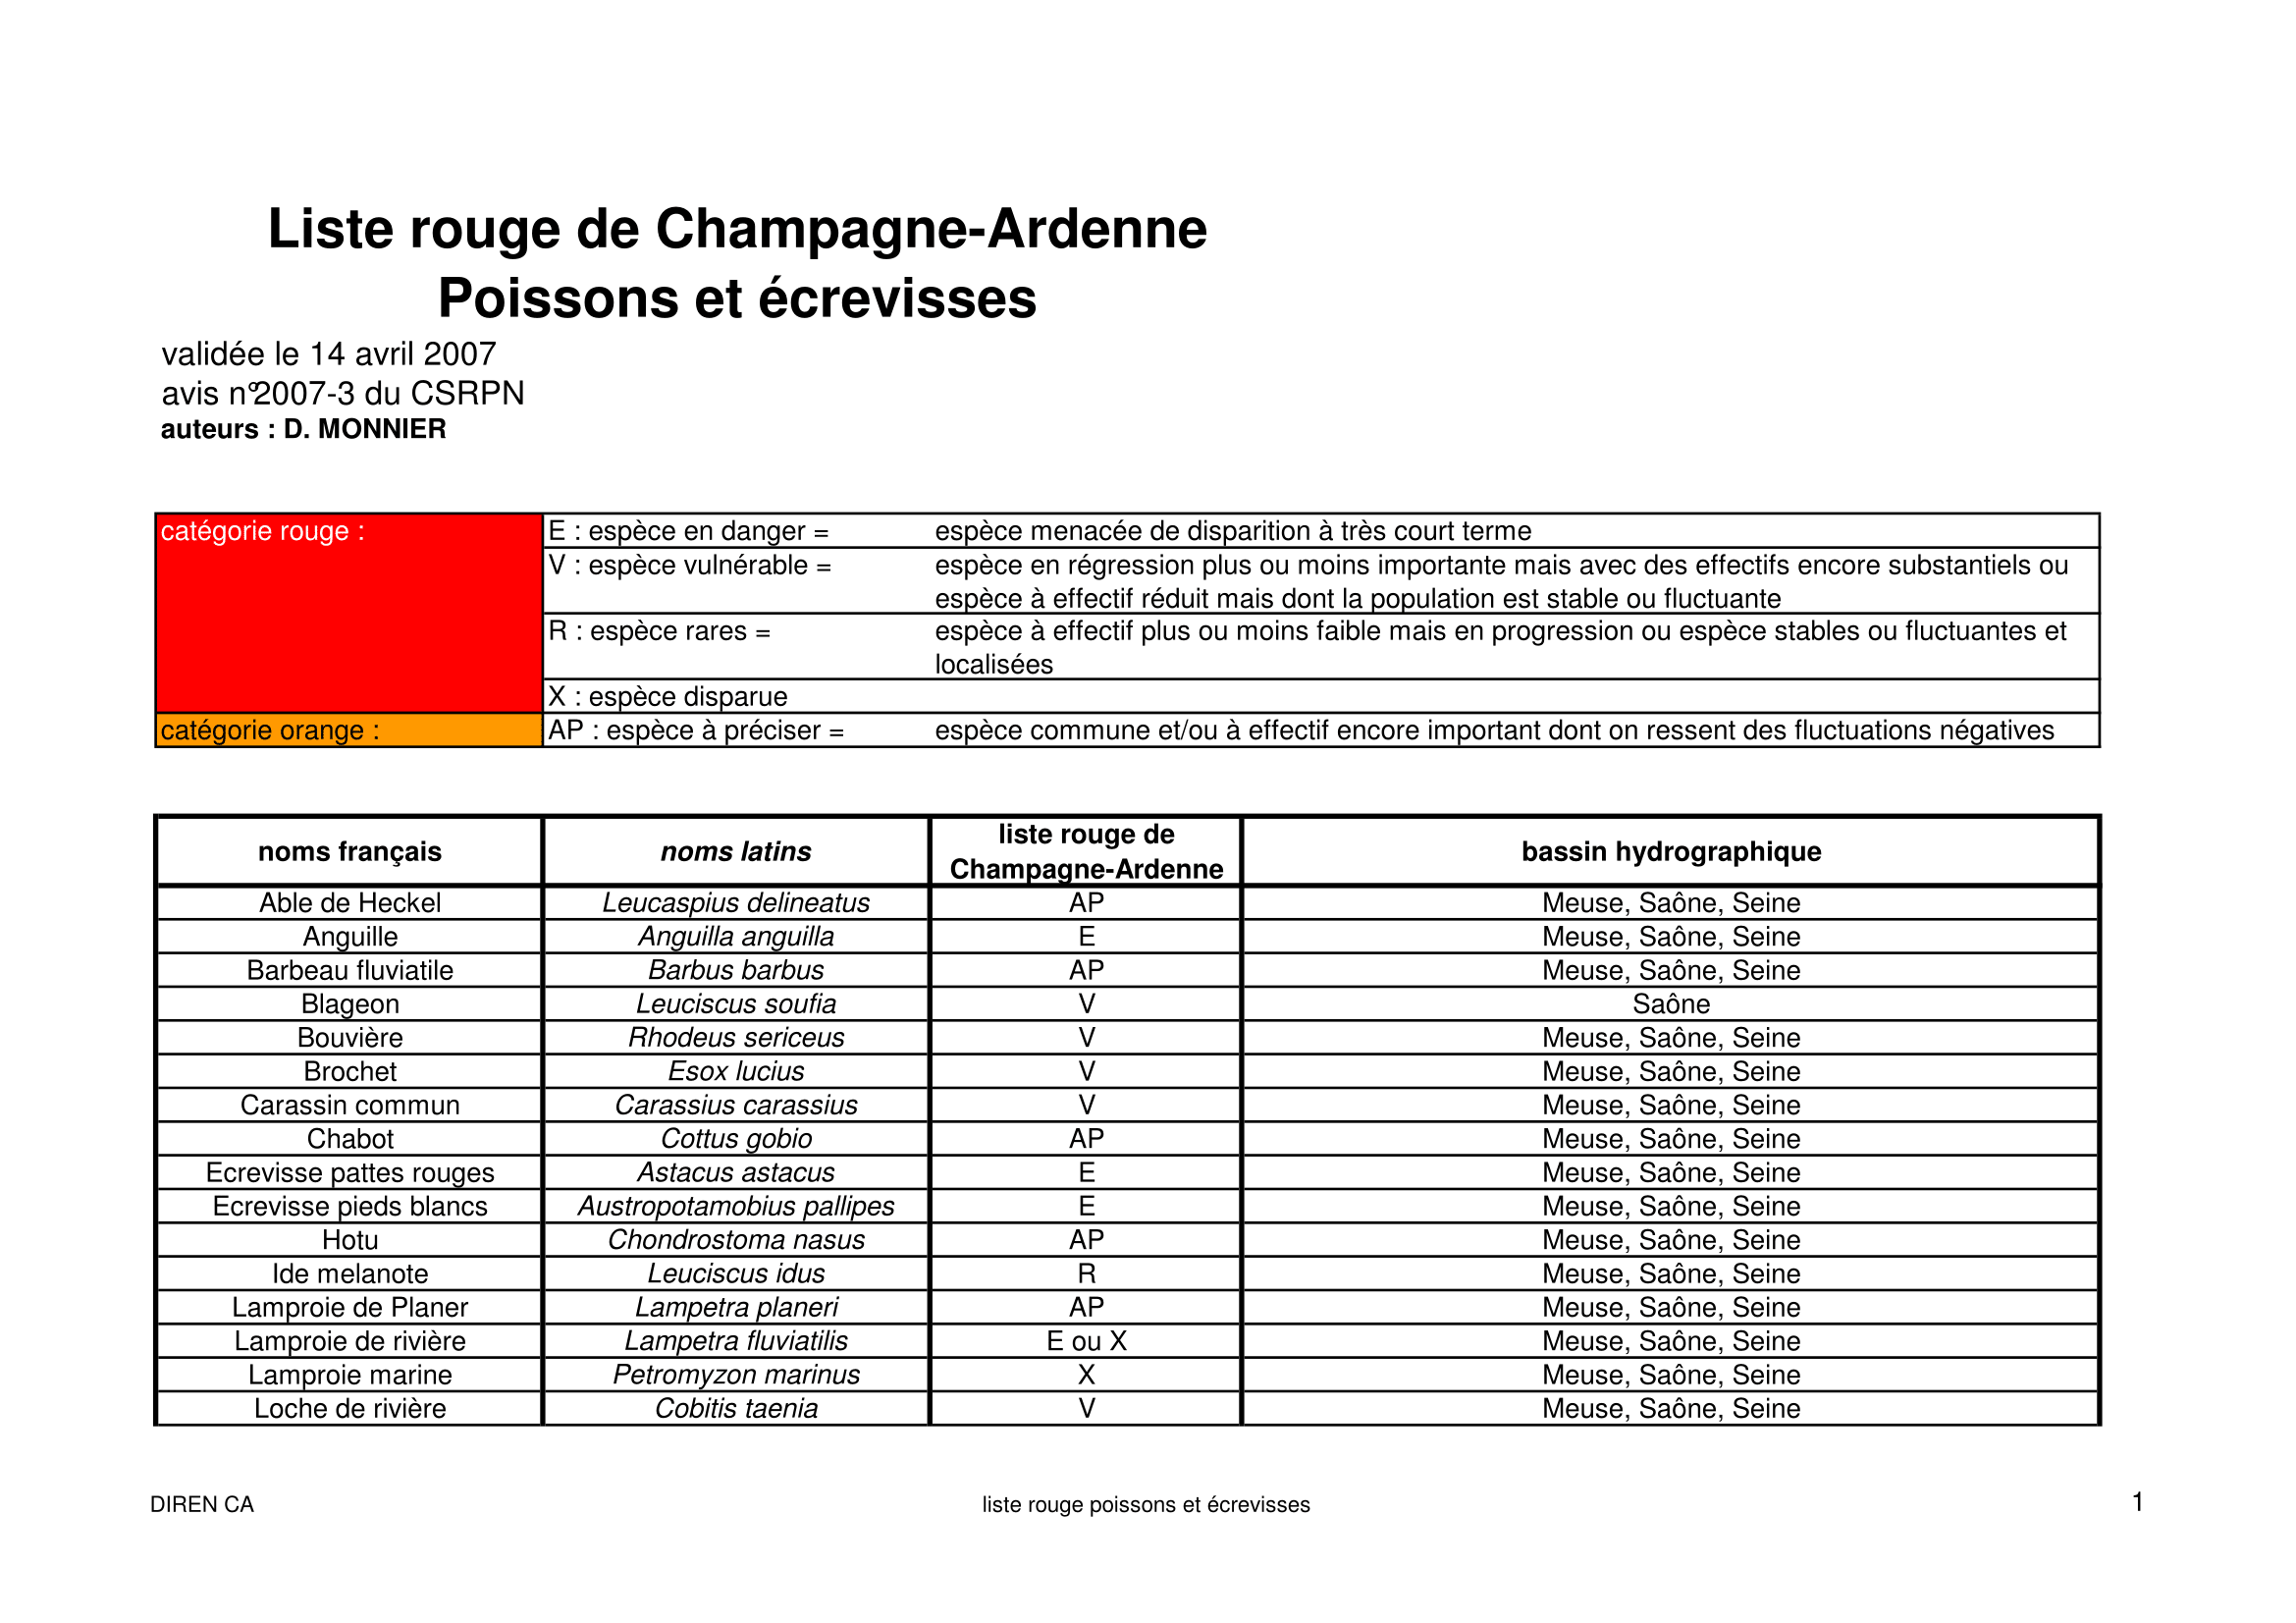 Poisson Ecrevisses (CA)